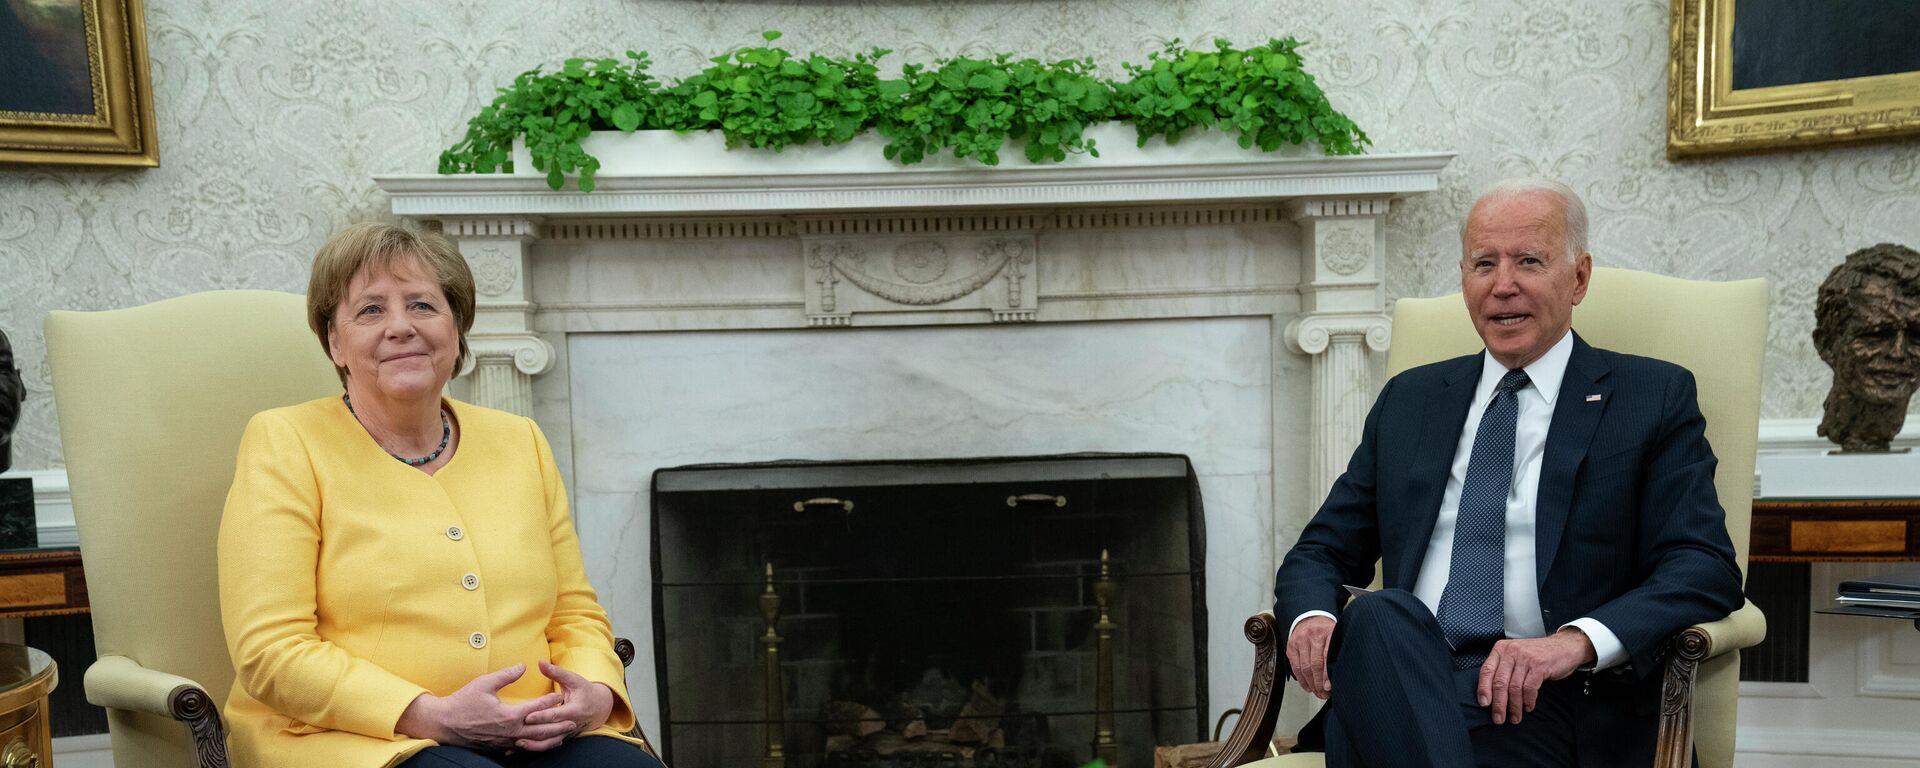 Bundeskanzlerin Angela Merkel und US-Präsident Joe Biden in Washington am 15.07.21 - SNA, 1920, 16.07.2021